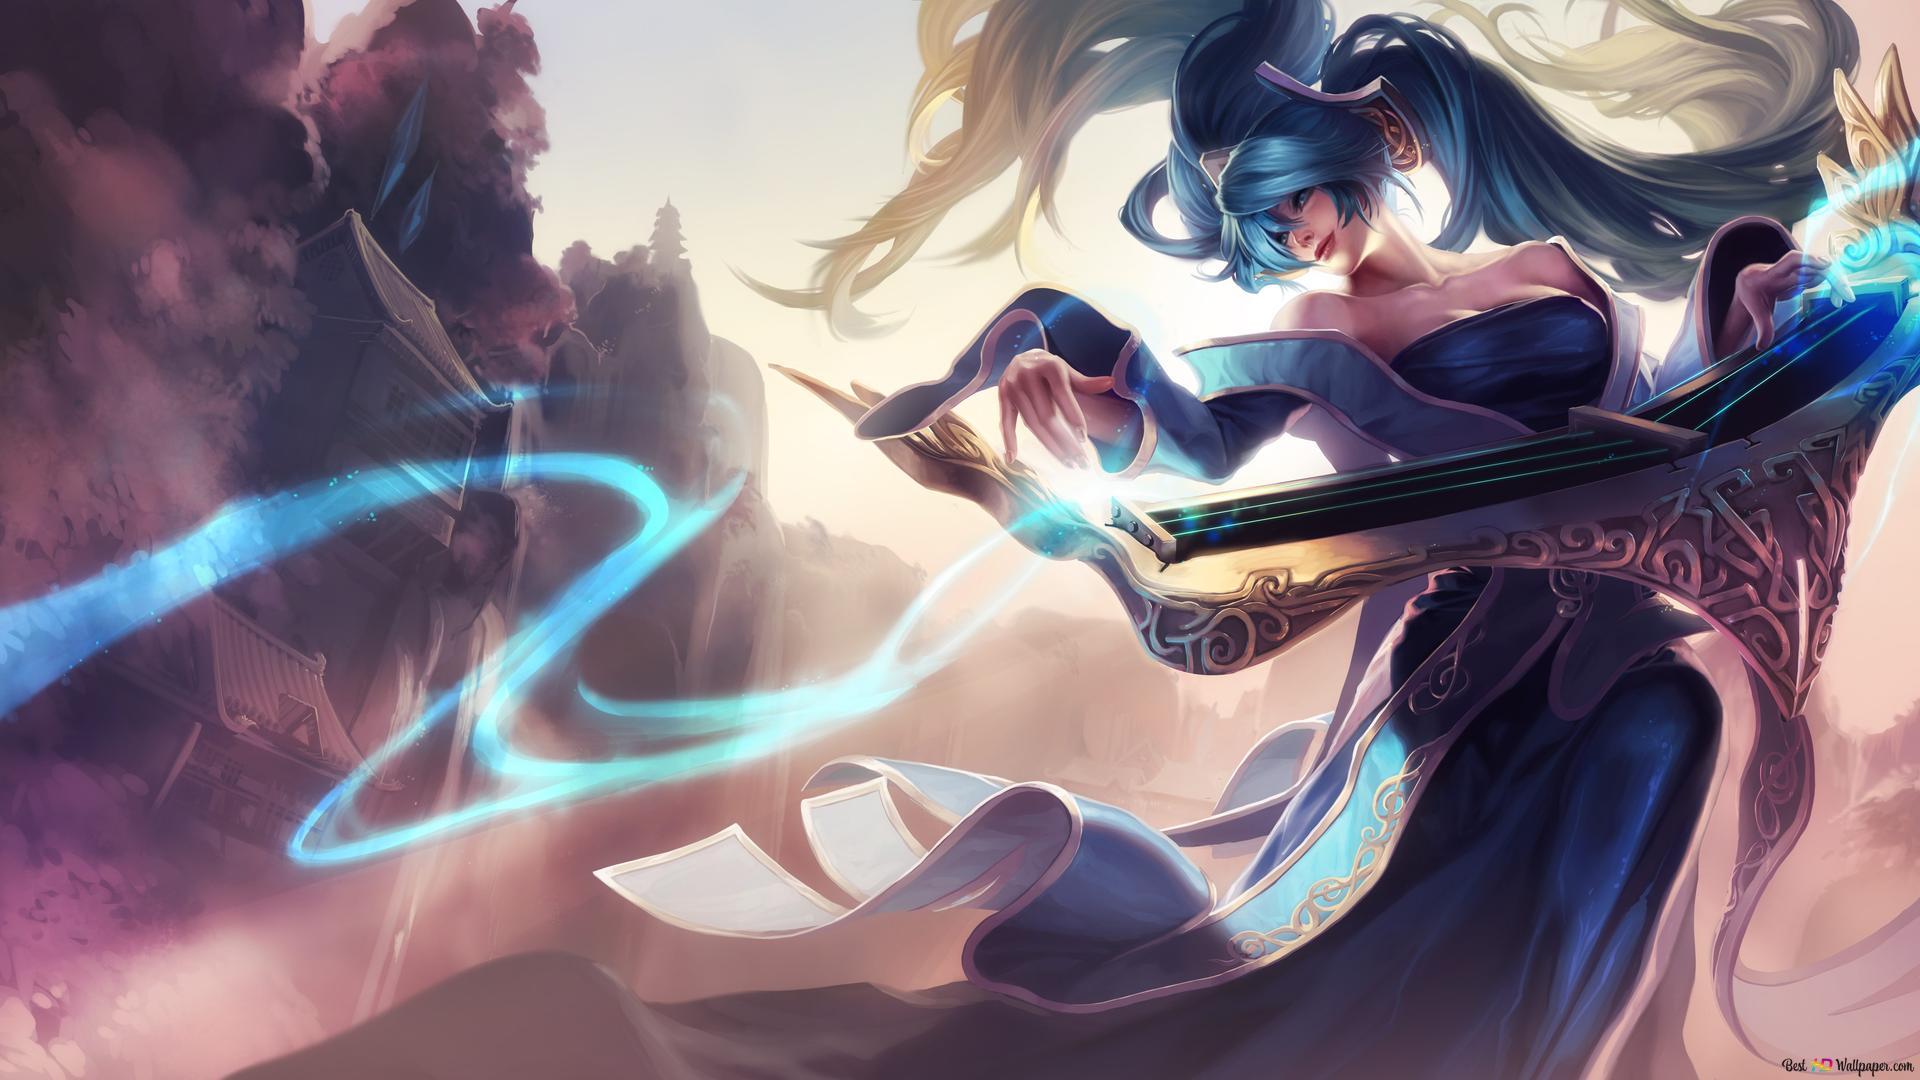 League Of Legends Sona Fantasy Art Hd Fond D Ecran Telecharger